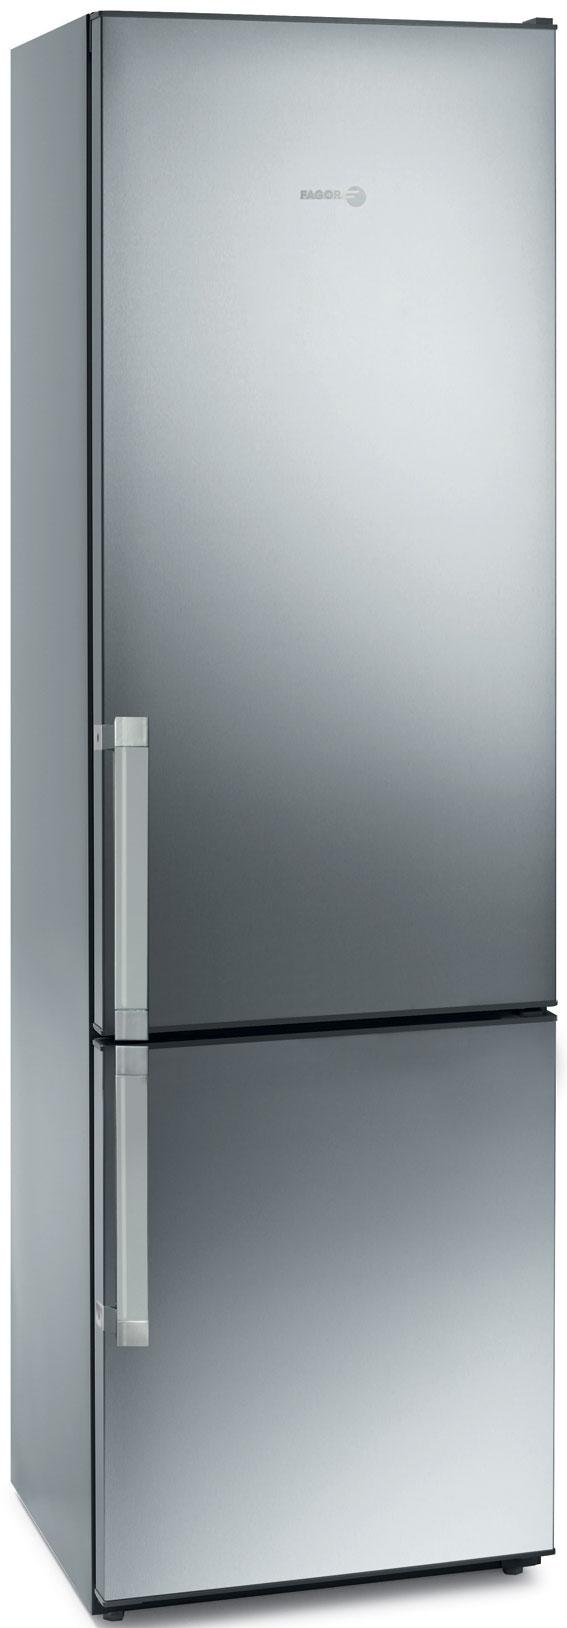 Tủ lạnh Fagor FFJ-6825X